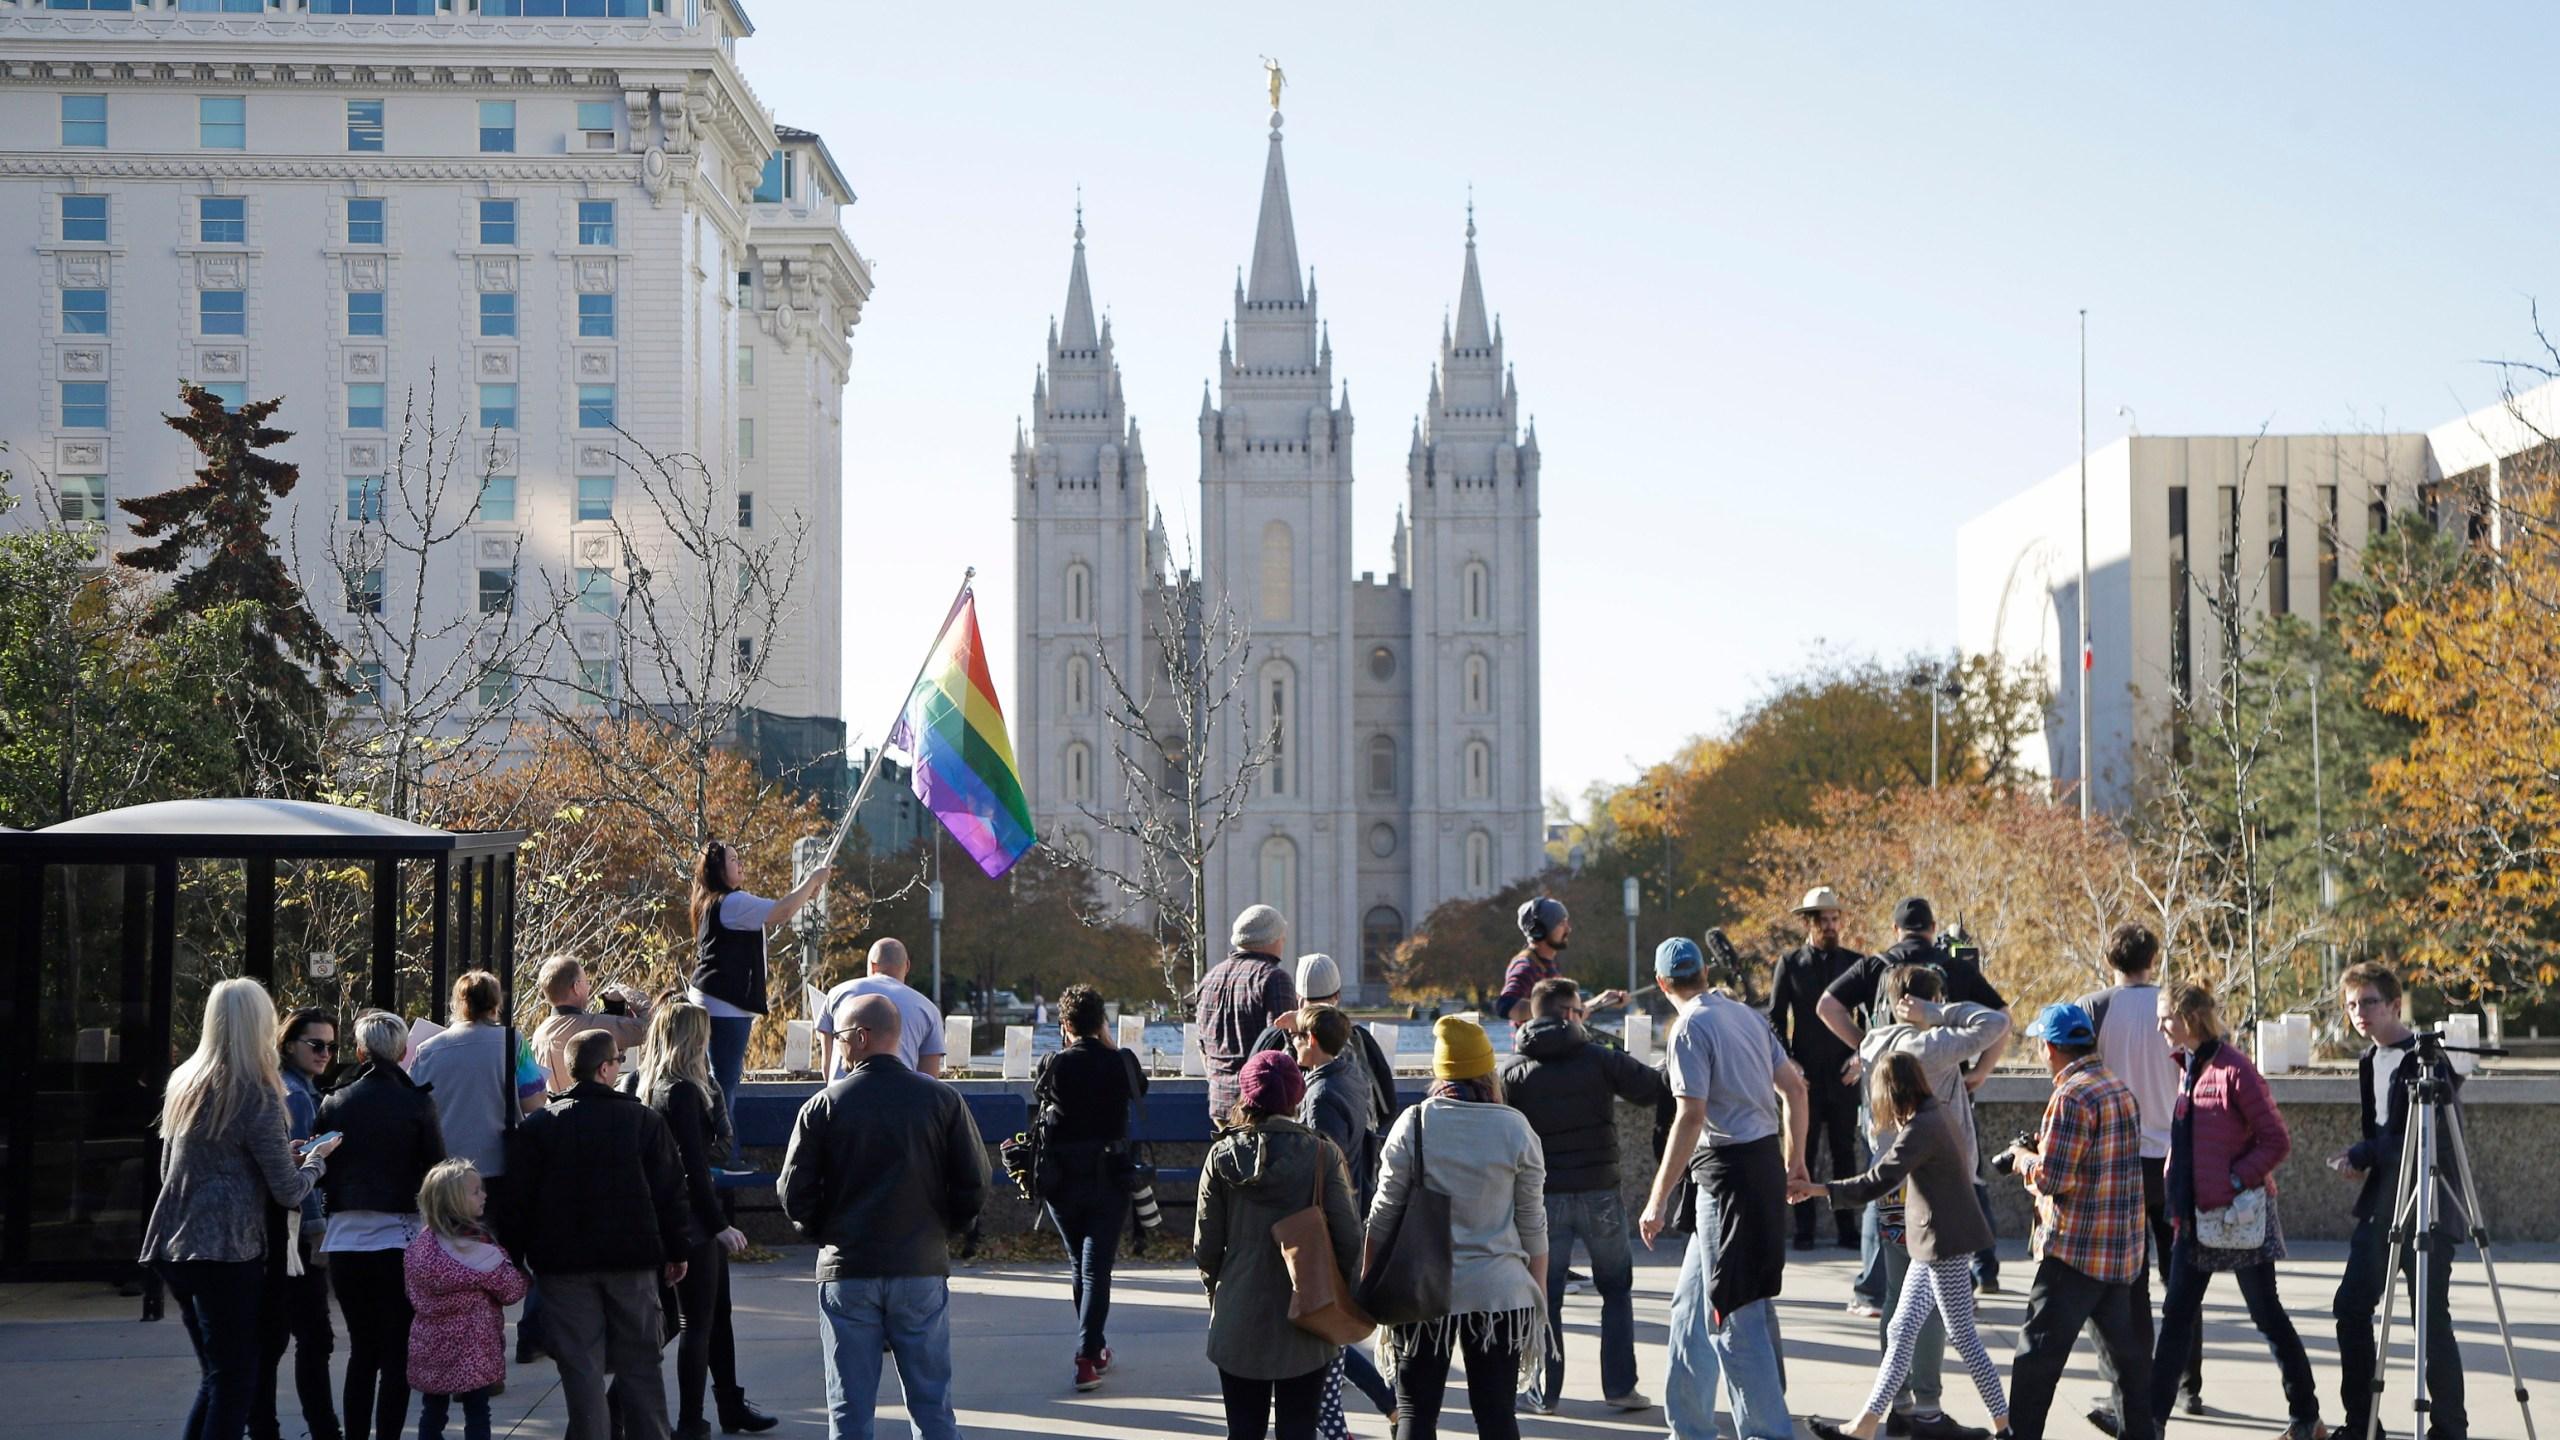 Mormons_LGBTQ_05504-159532.jpg74949202